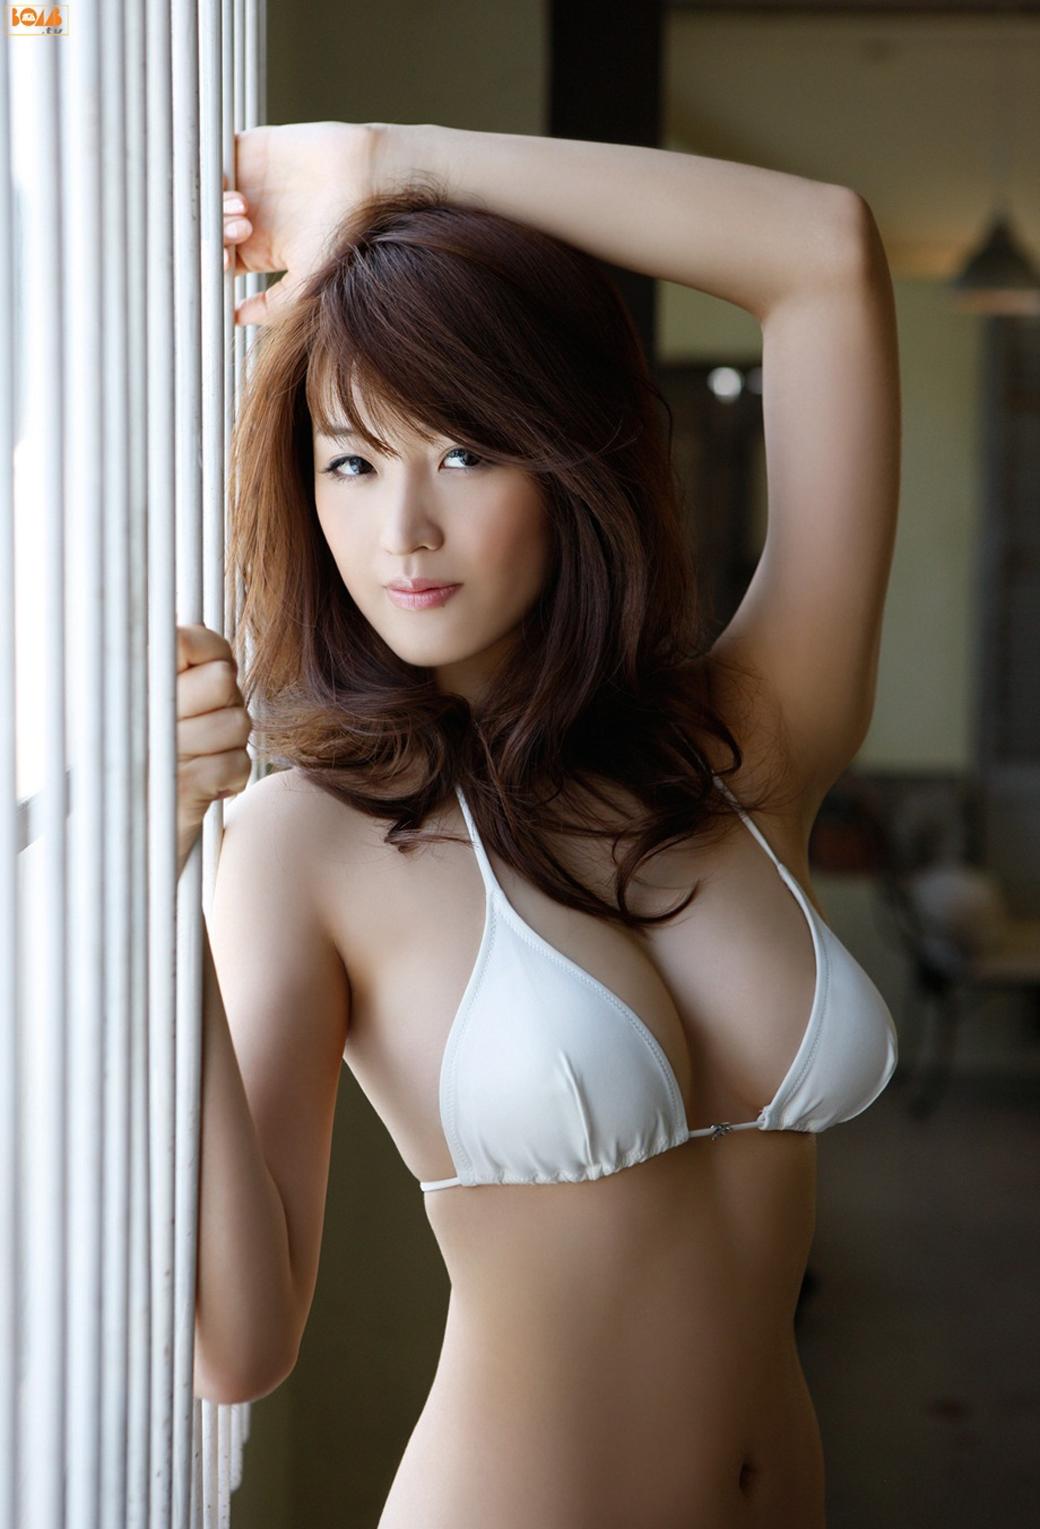 Big boob gallery photo